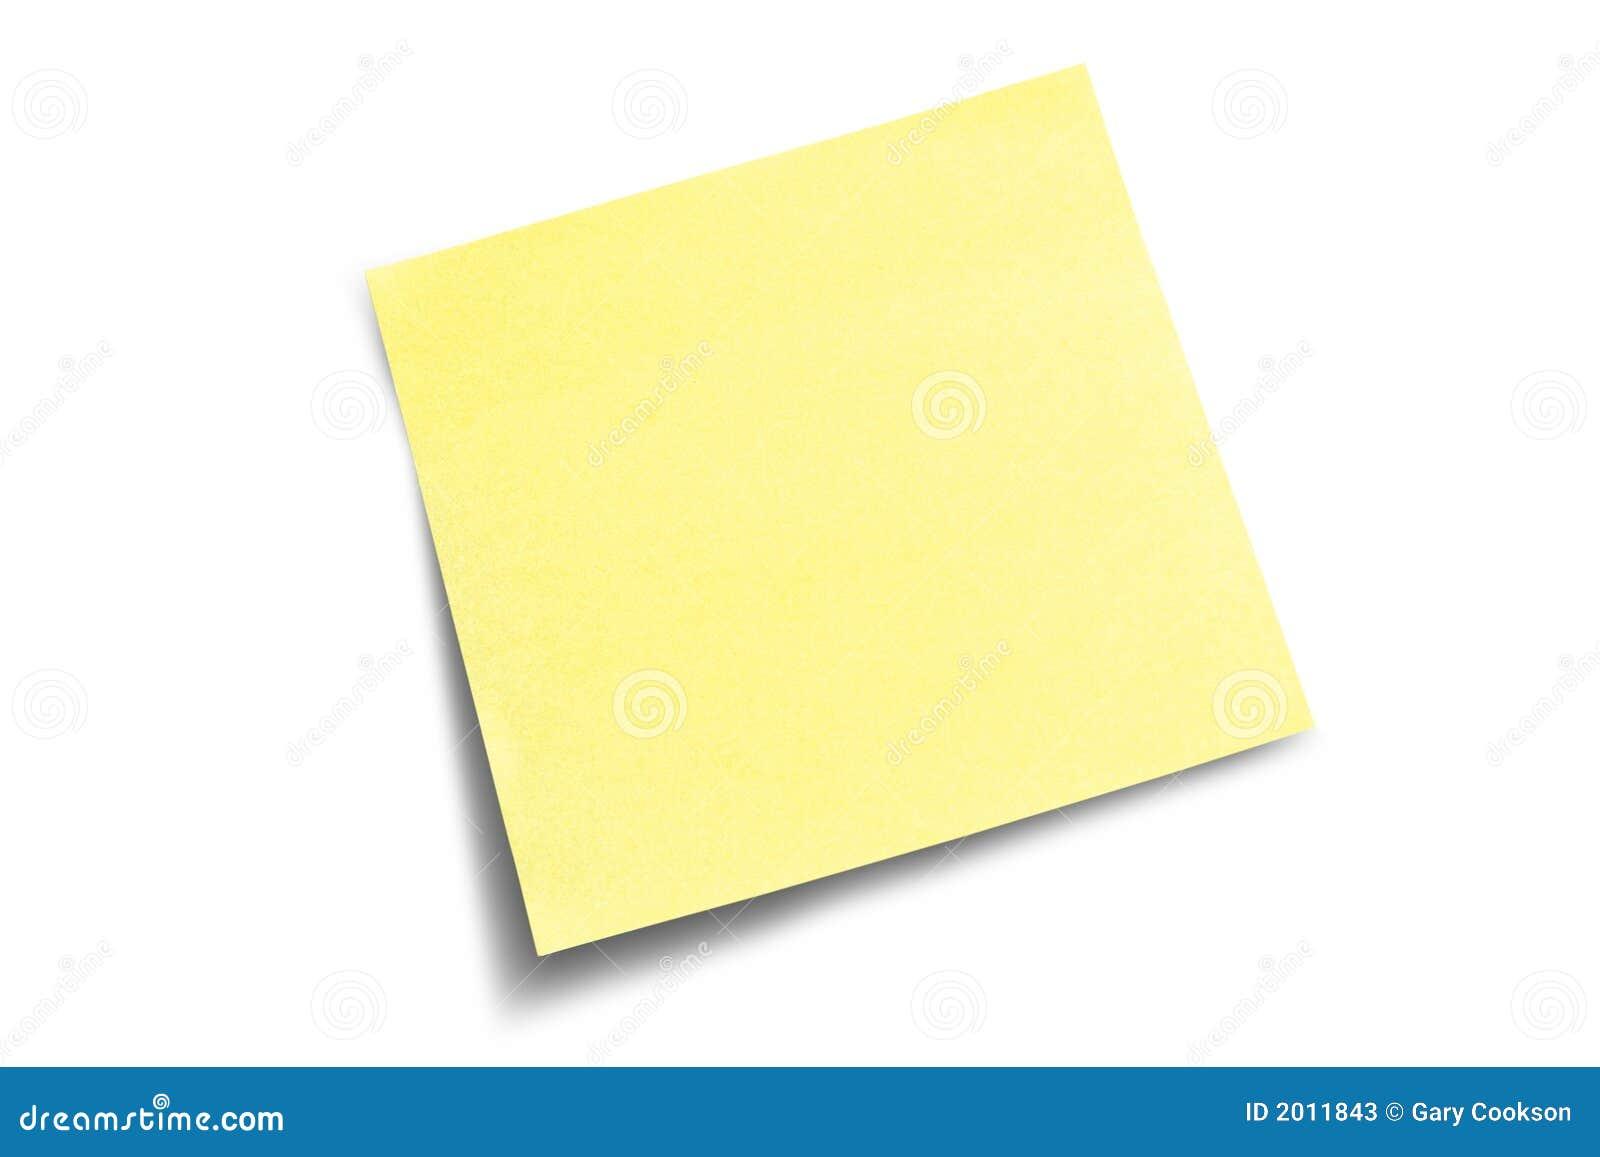 Clipart Yellow Highlighter